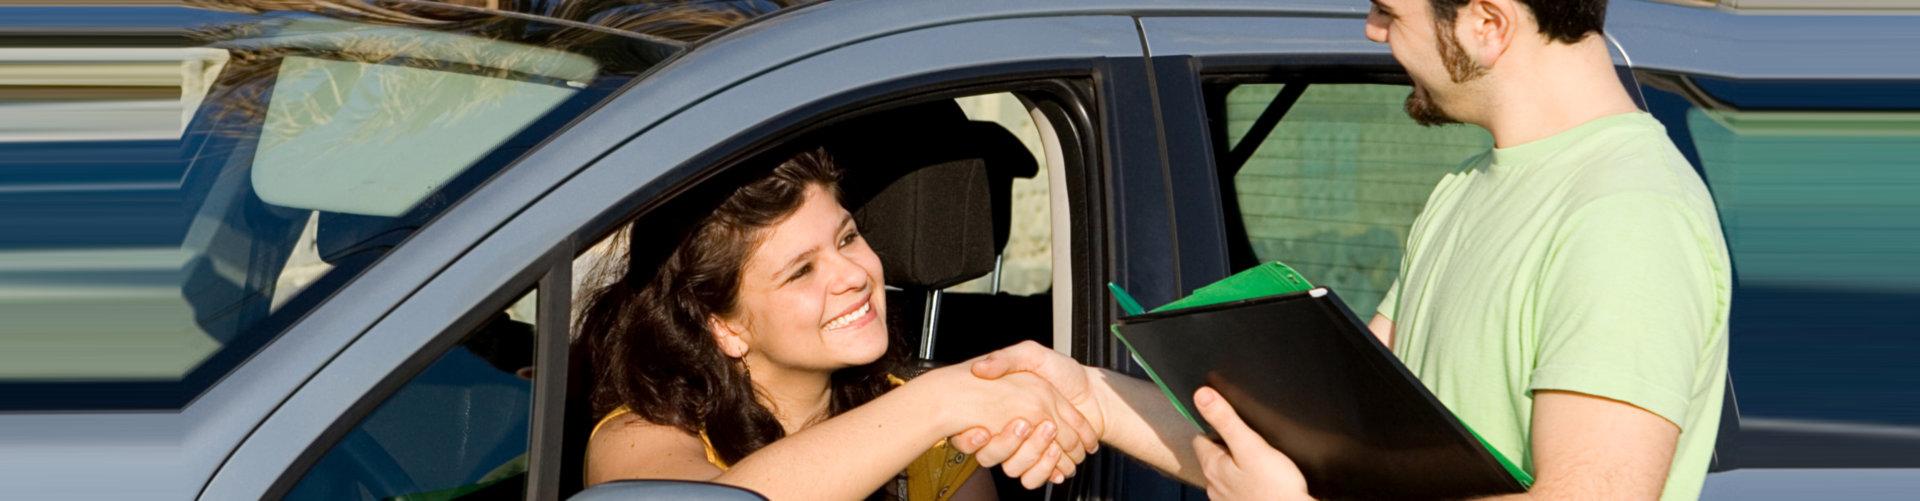 Woman passing driving exam